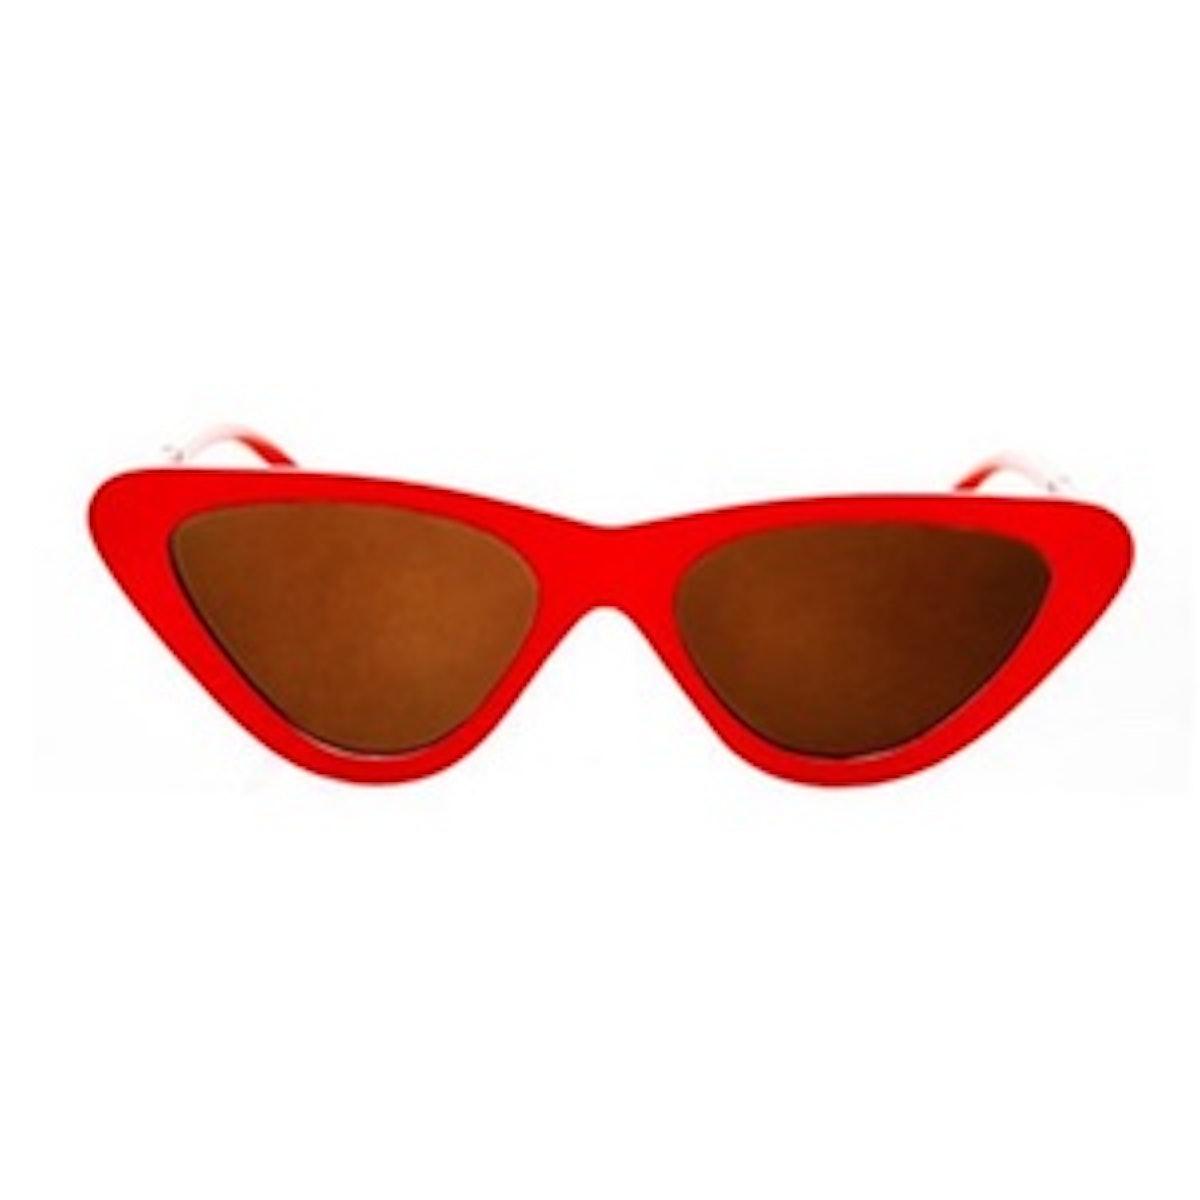 Polly '90s Pointy Cateye Sunglasses